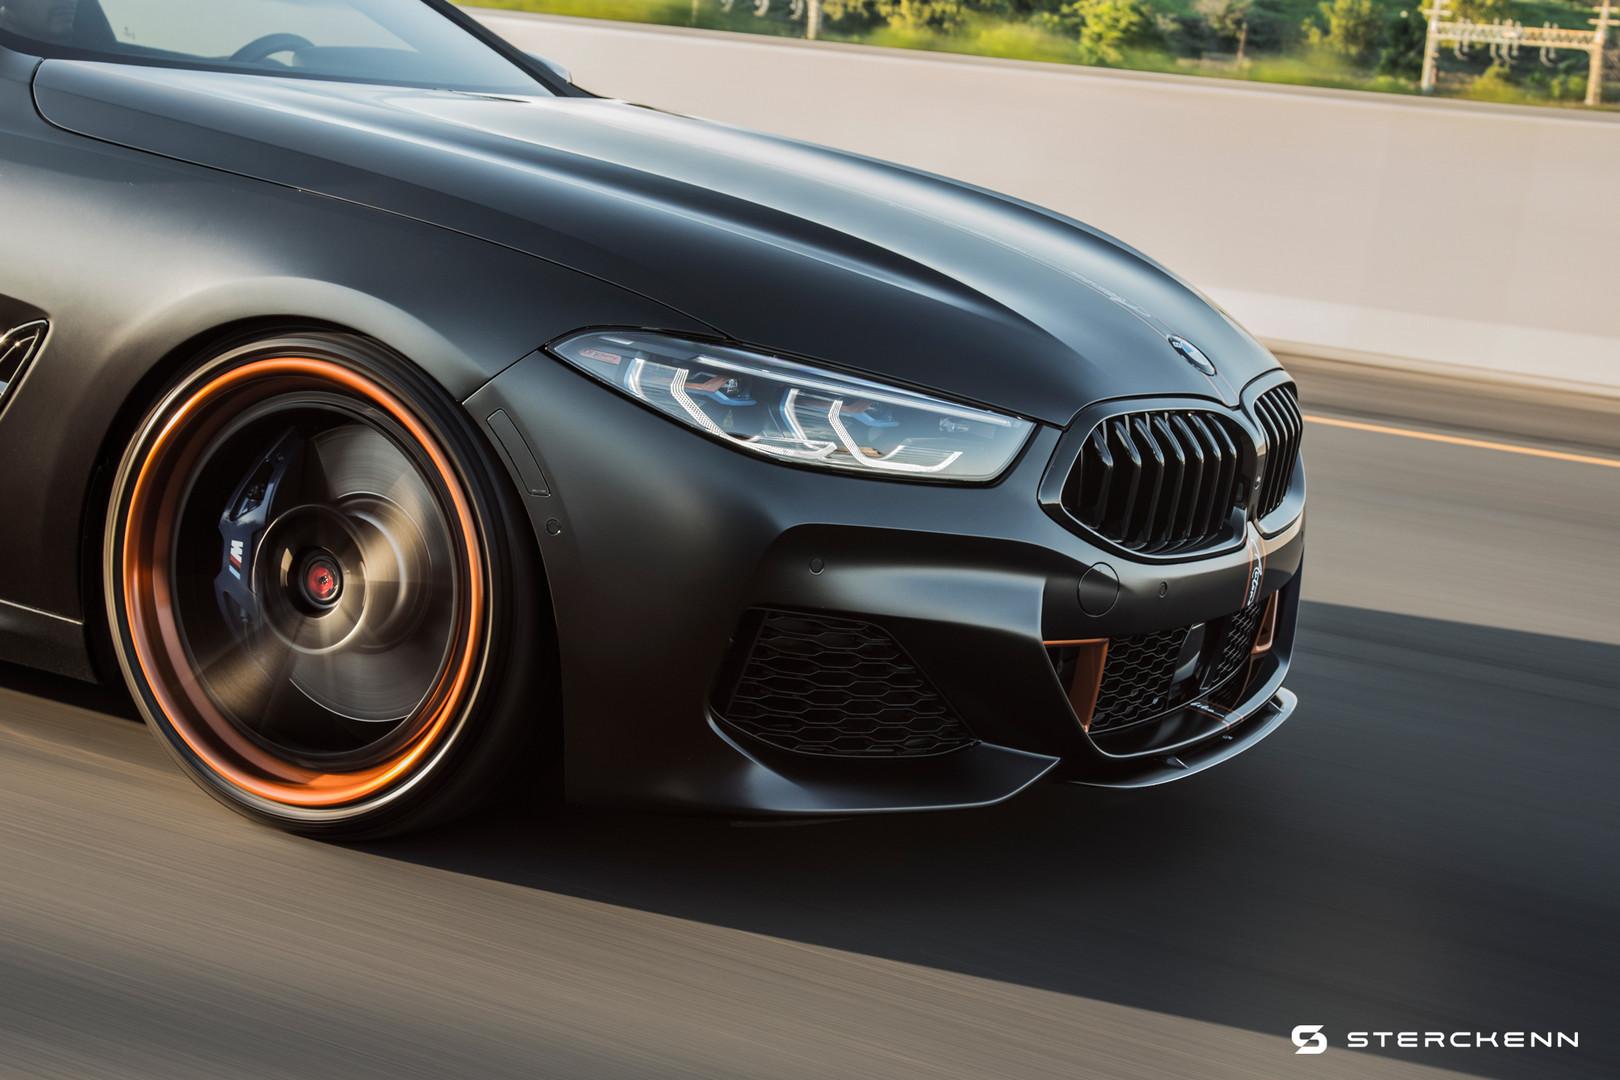 Sterckenn BMW Lip